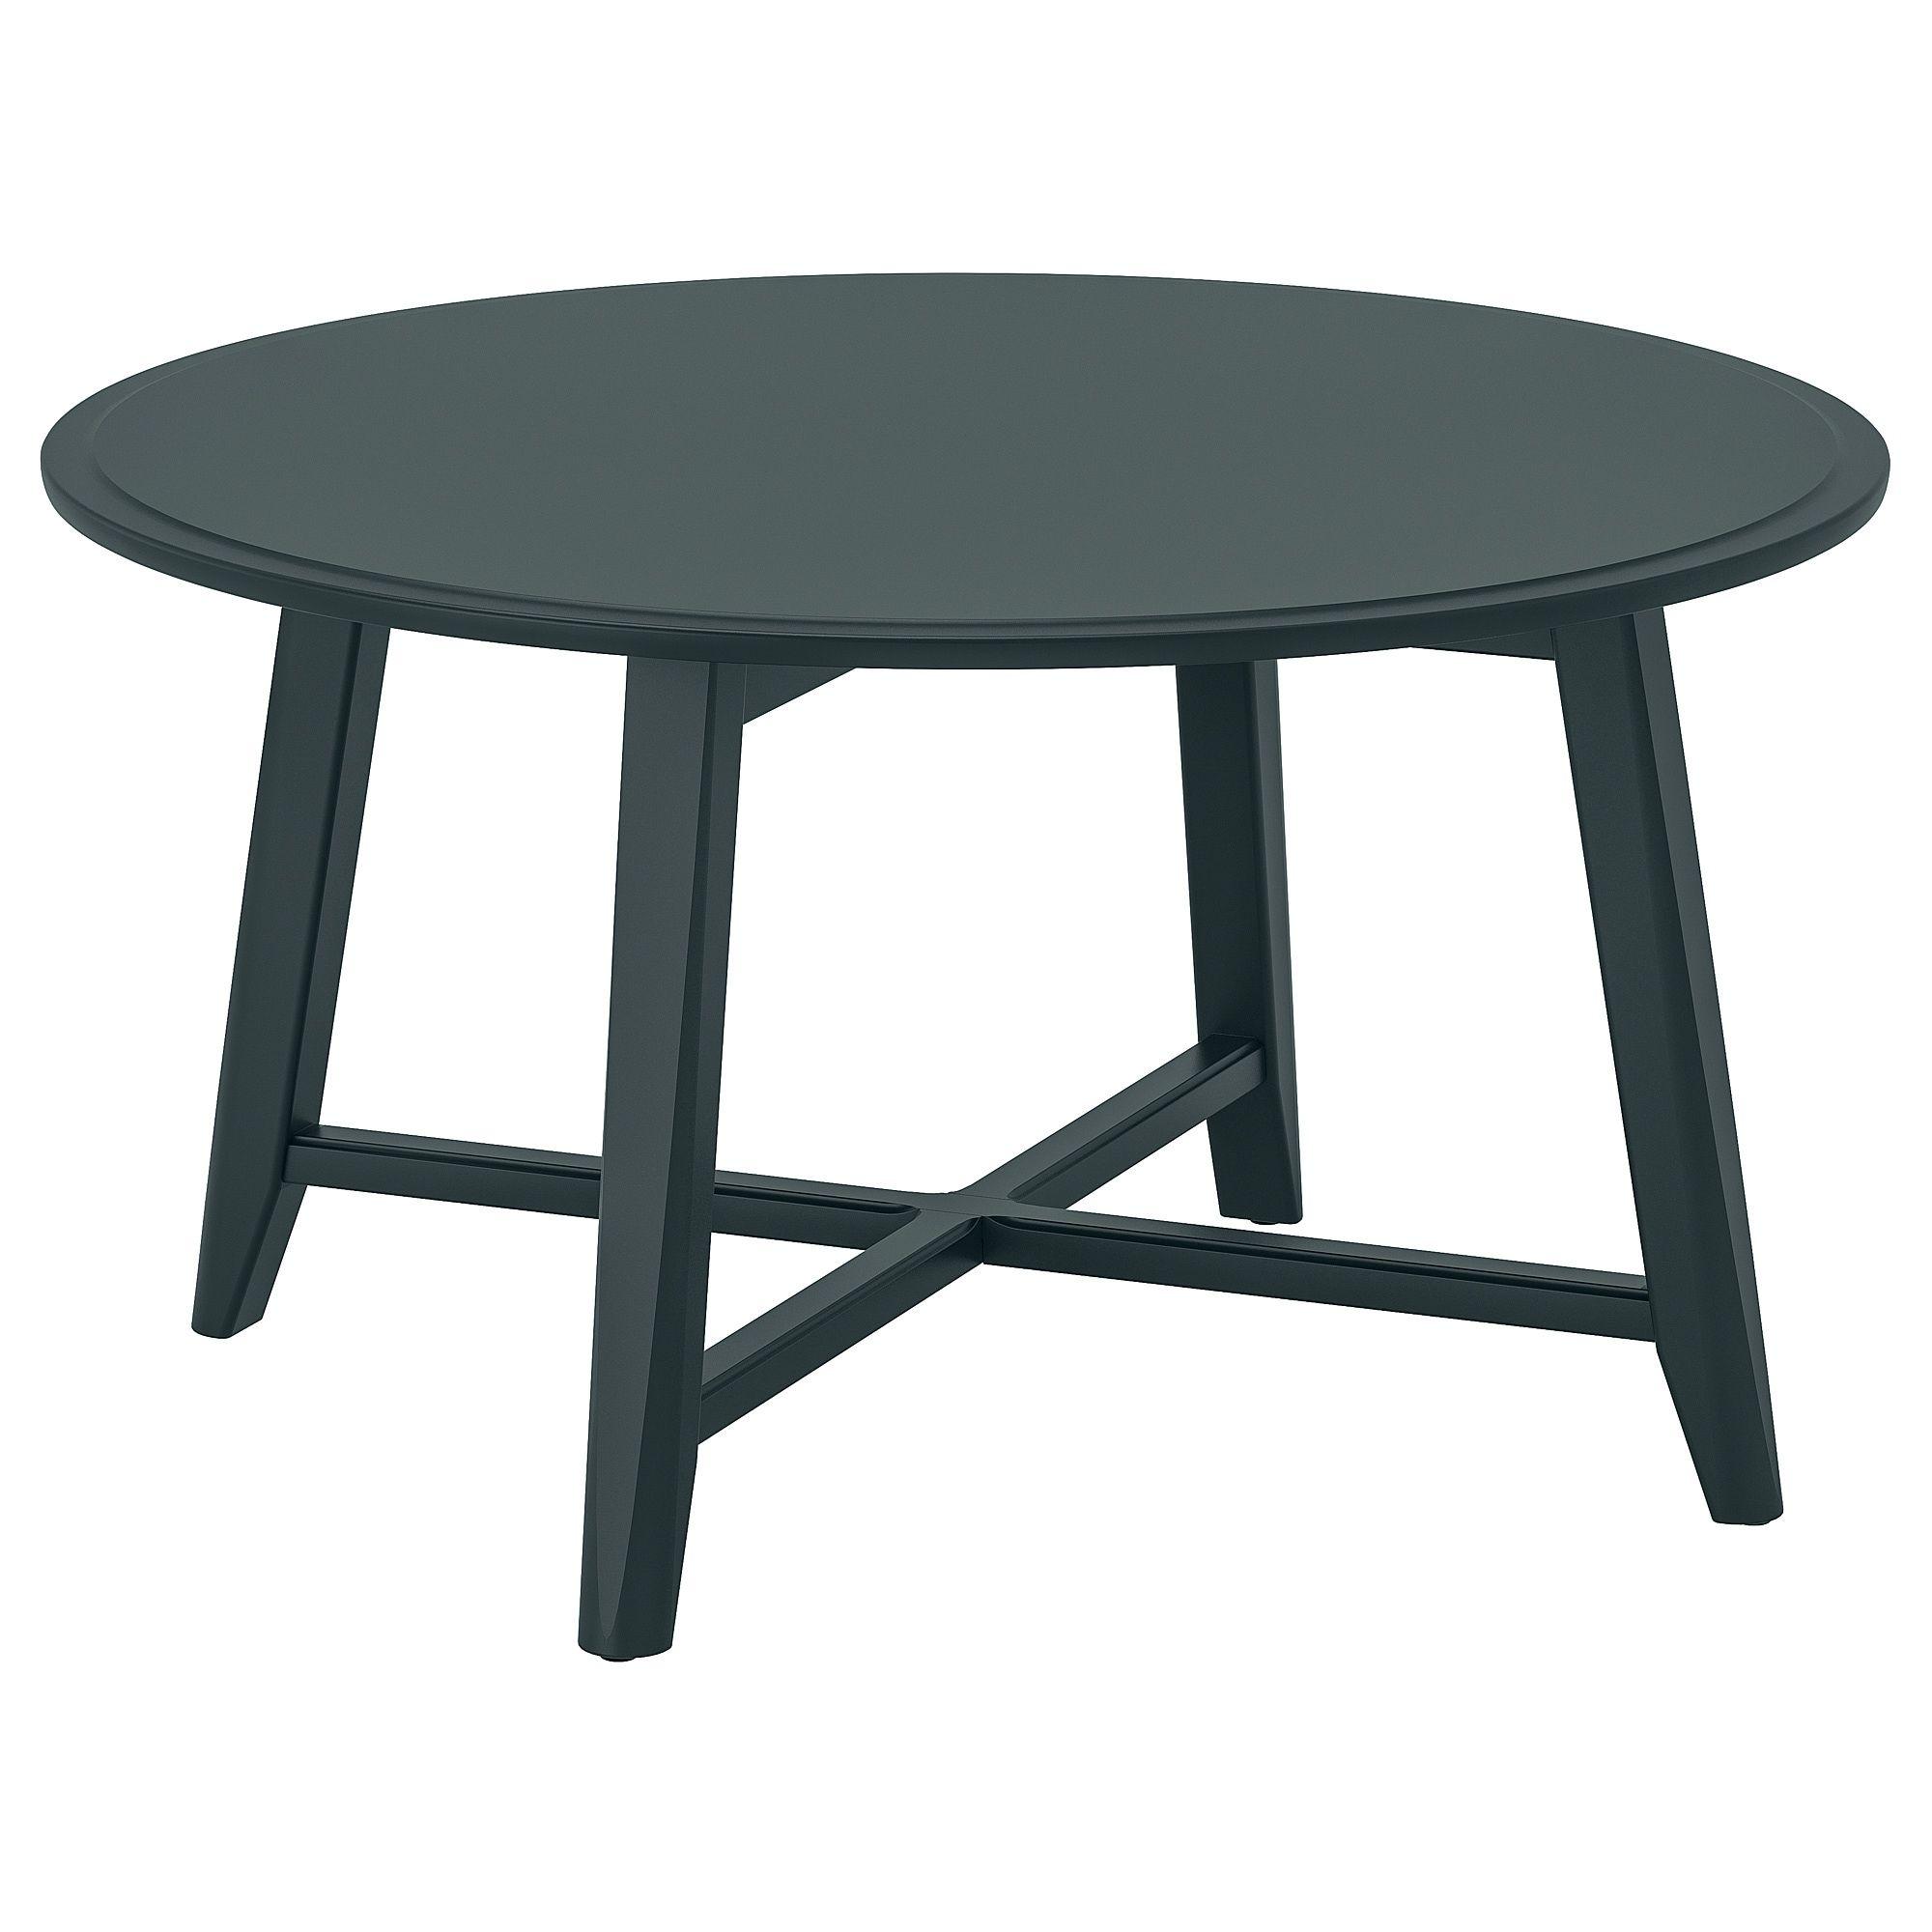 "KRAGSTA Coffee table dark bluegreen 35 3/8 "" Green"